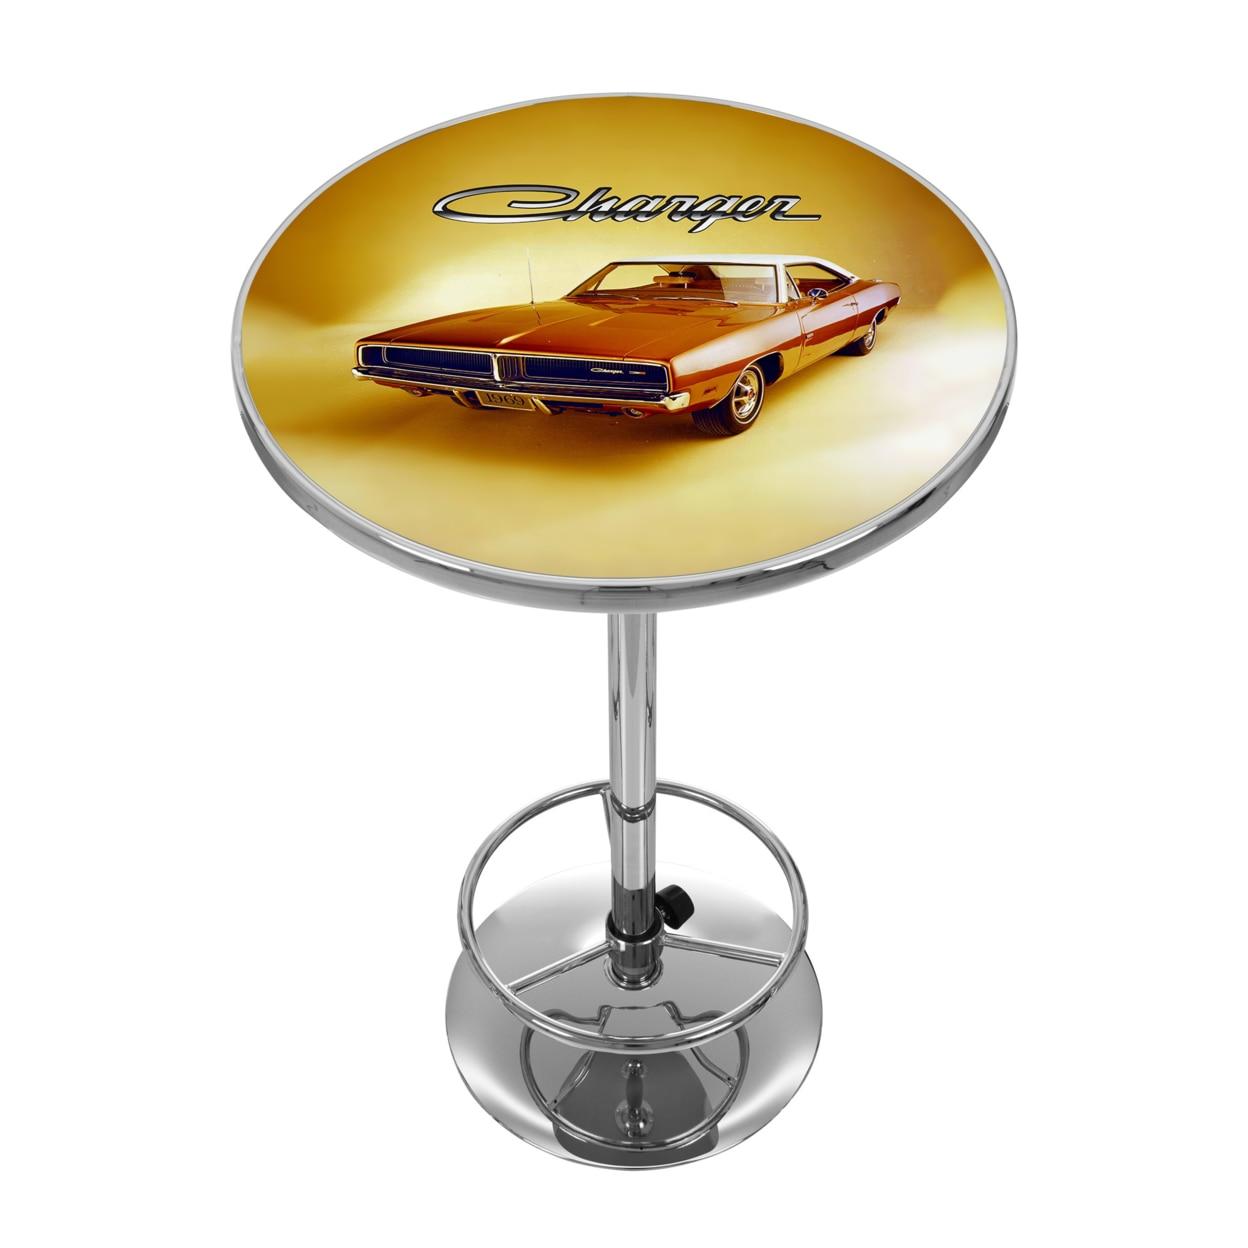 Dodge Chrome 42 Inch Pub Table - 69 Charger siku полицейская машина dodge charger